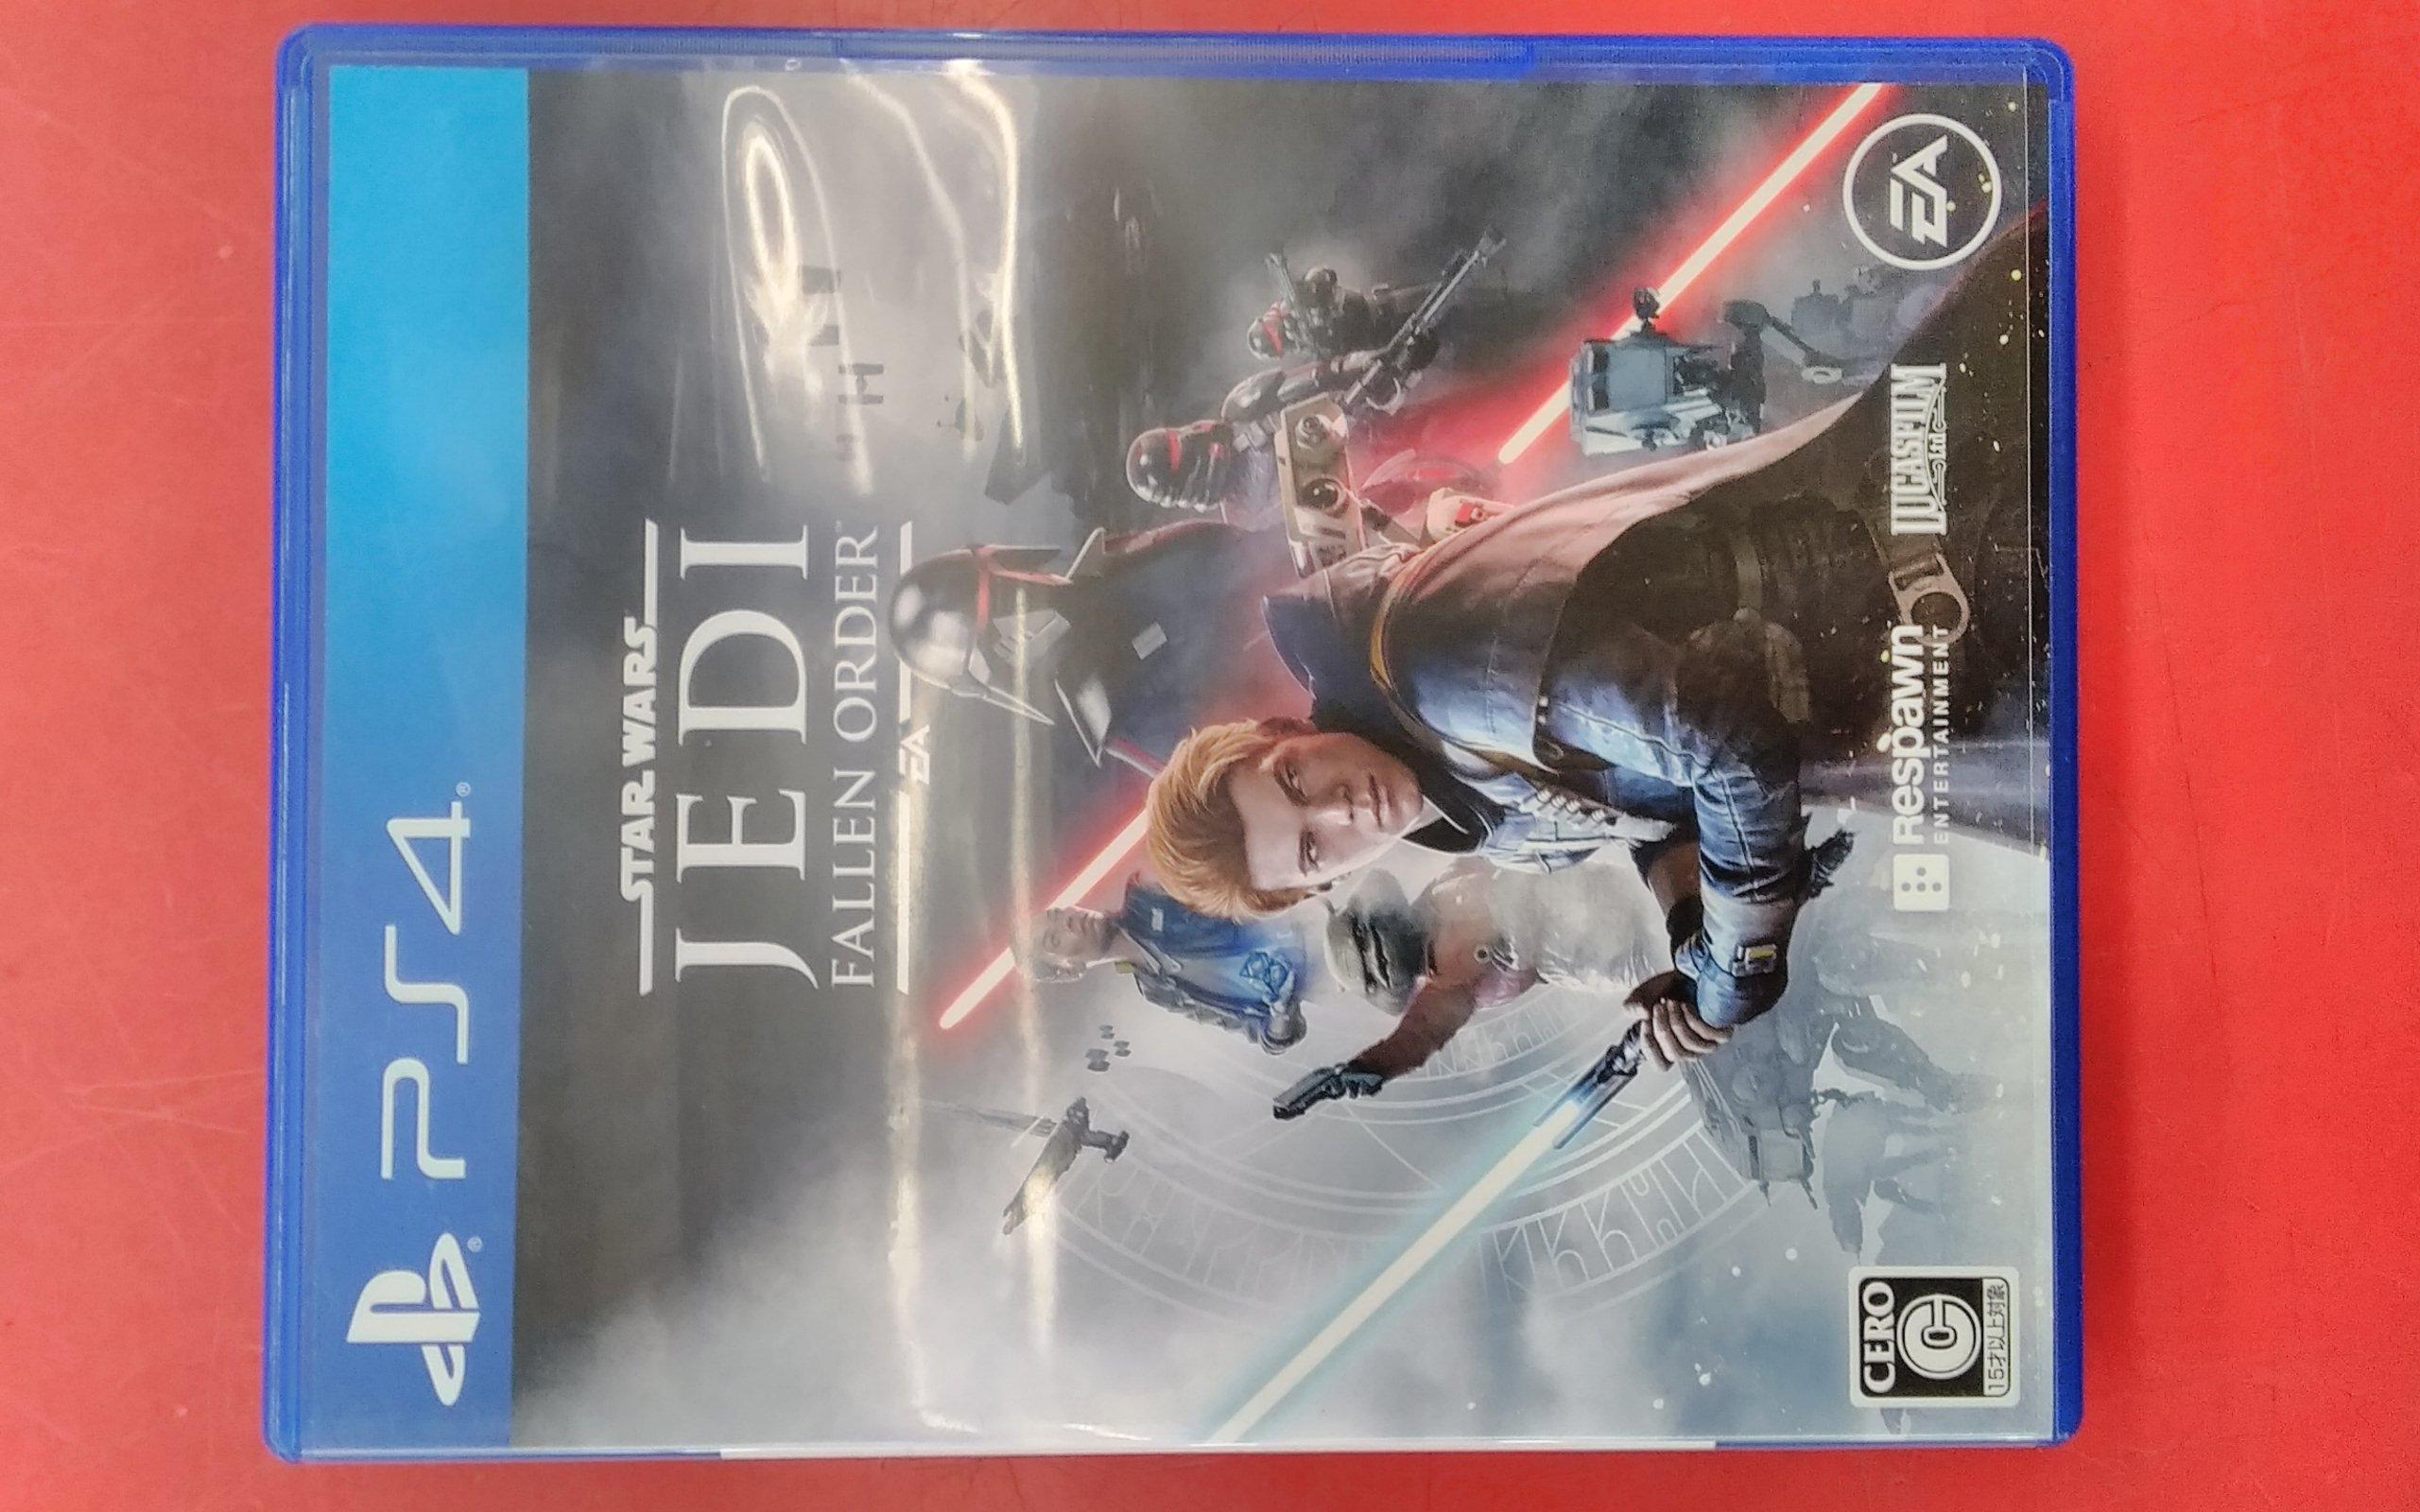 PS4用ソフト/スターウォーズ ジェダイ フォールン オーダ|エレクトロニック・アーツ